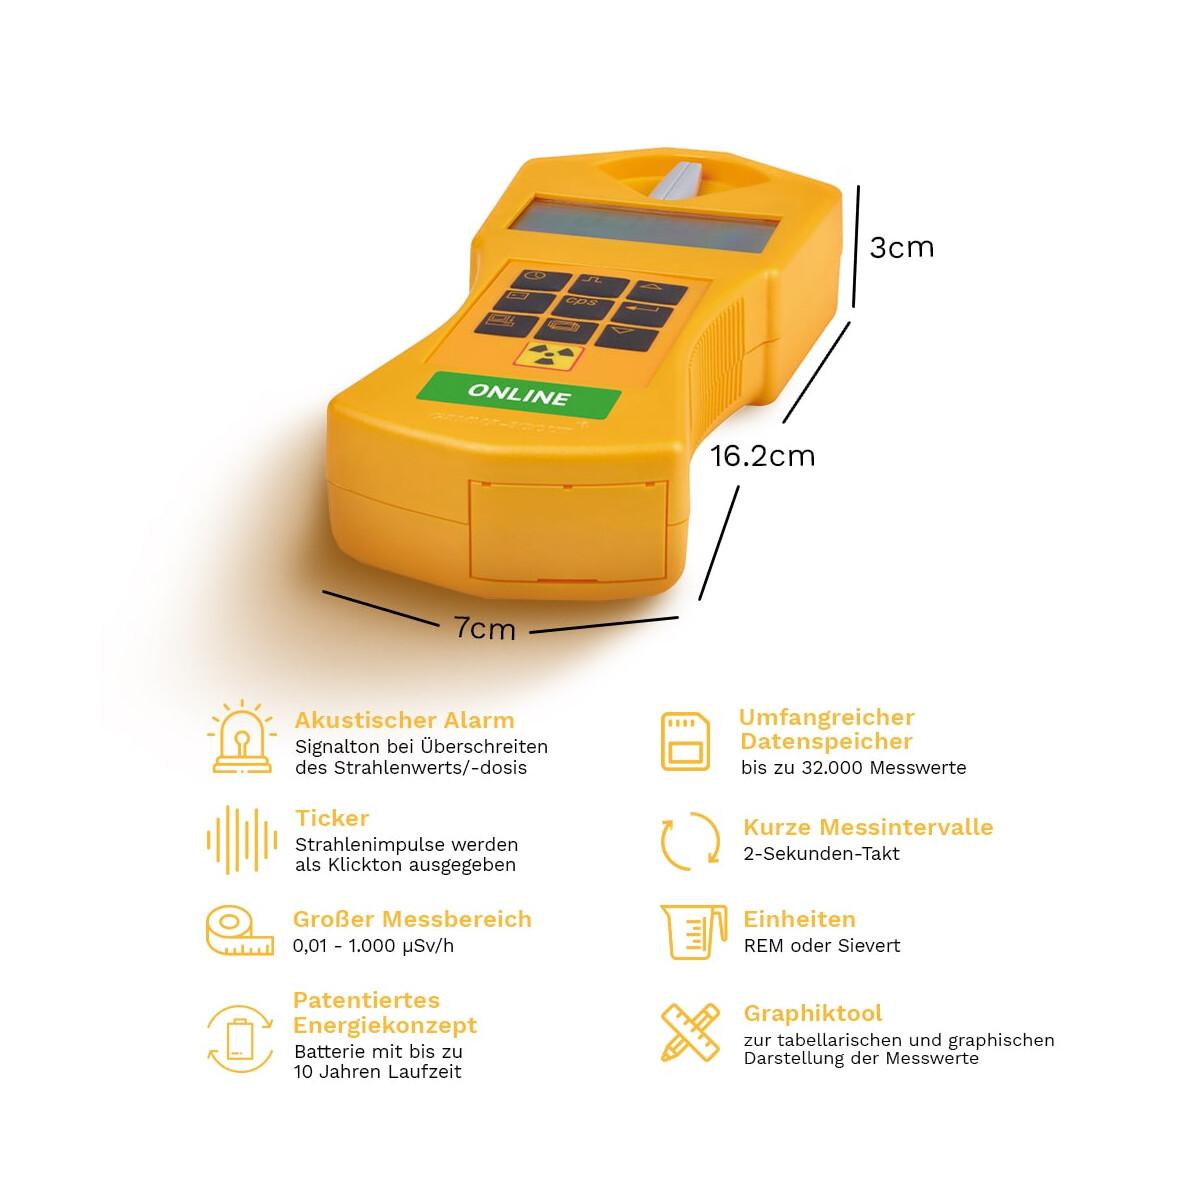 gamma scout online geigerz hler radioaktivit t messen 498 00. Black Bedroom Furniture Sets. Home Design Ideas